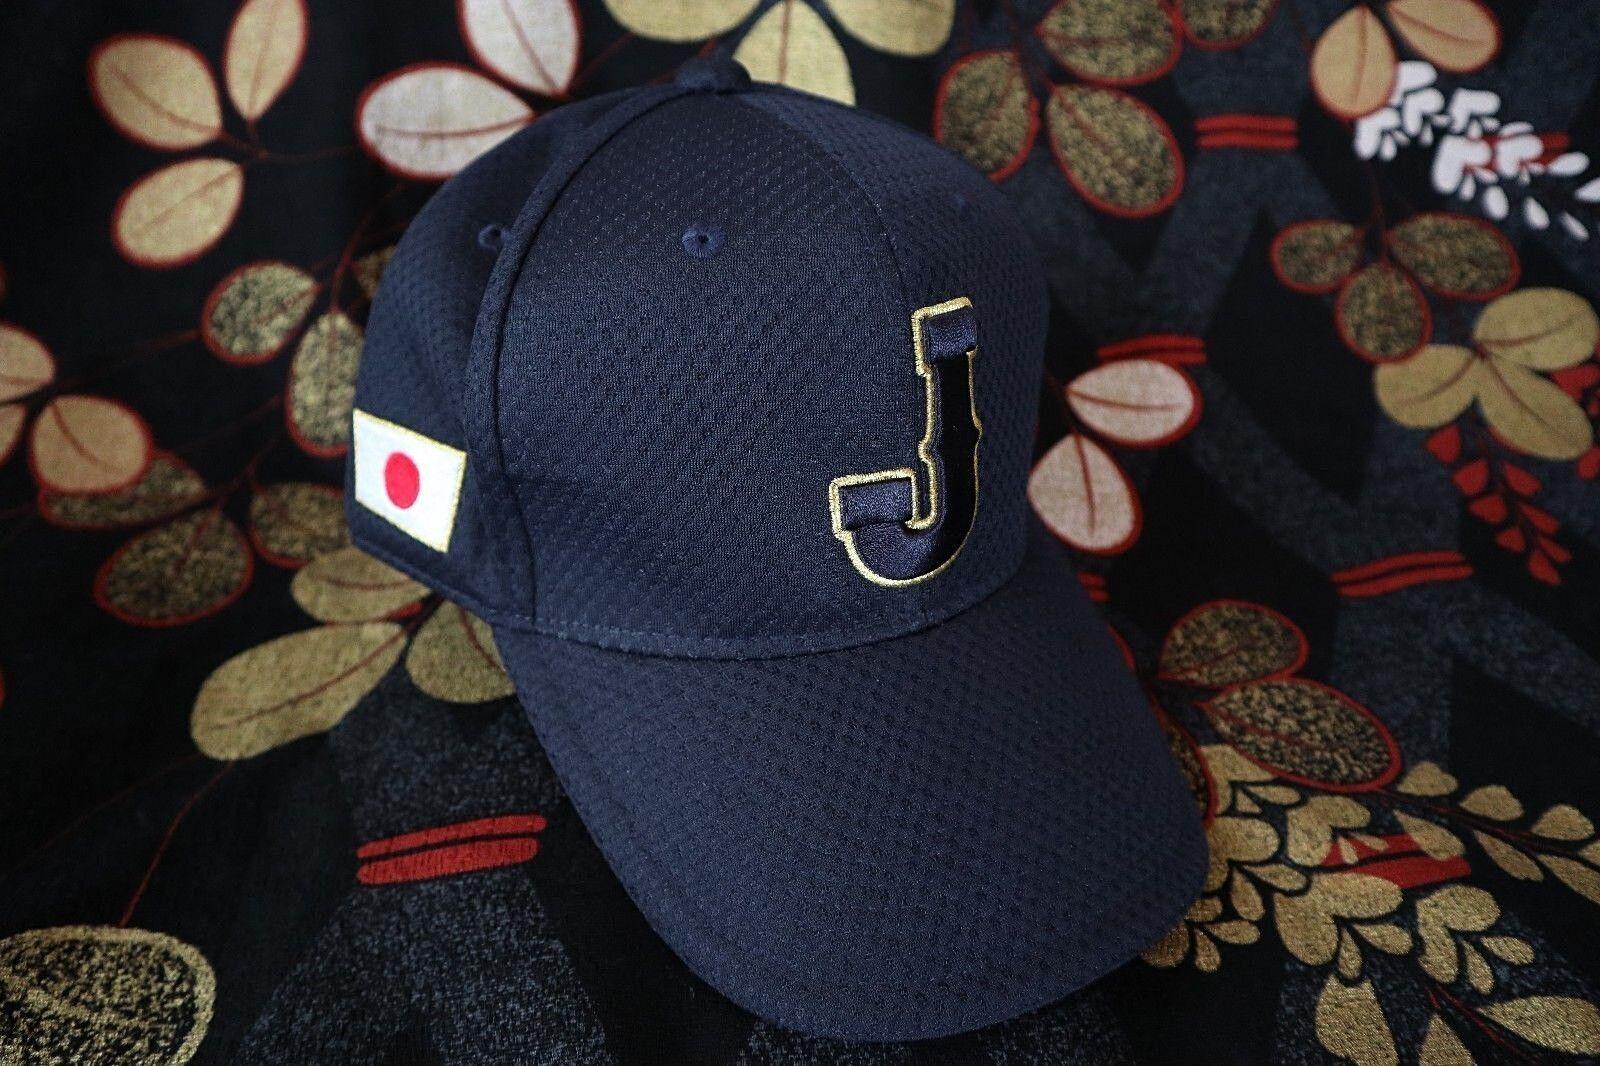 WBC World Baseball Classic SAMURAI JAPAN OFFICIAL OFFICIAL OFFICIAL CAP HINOMARU/SHOHEI OTANI LOT 3aae0d